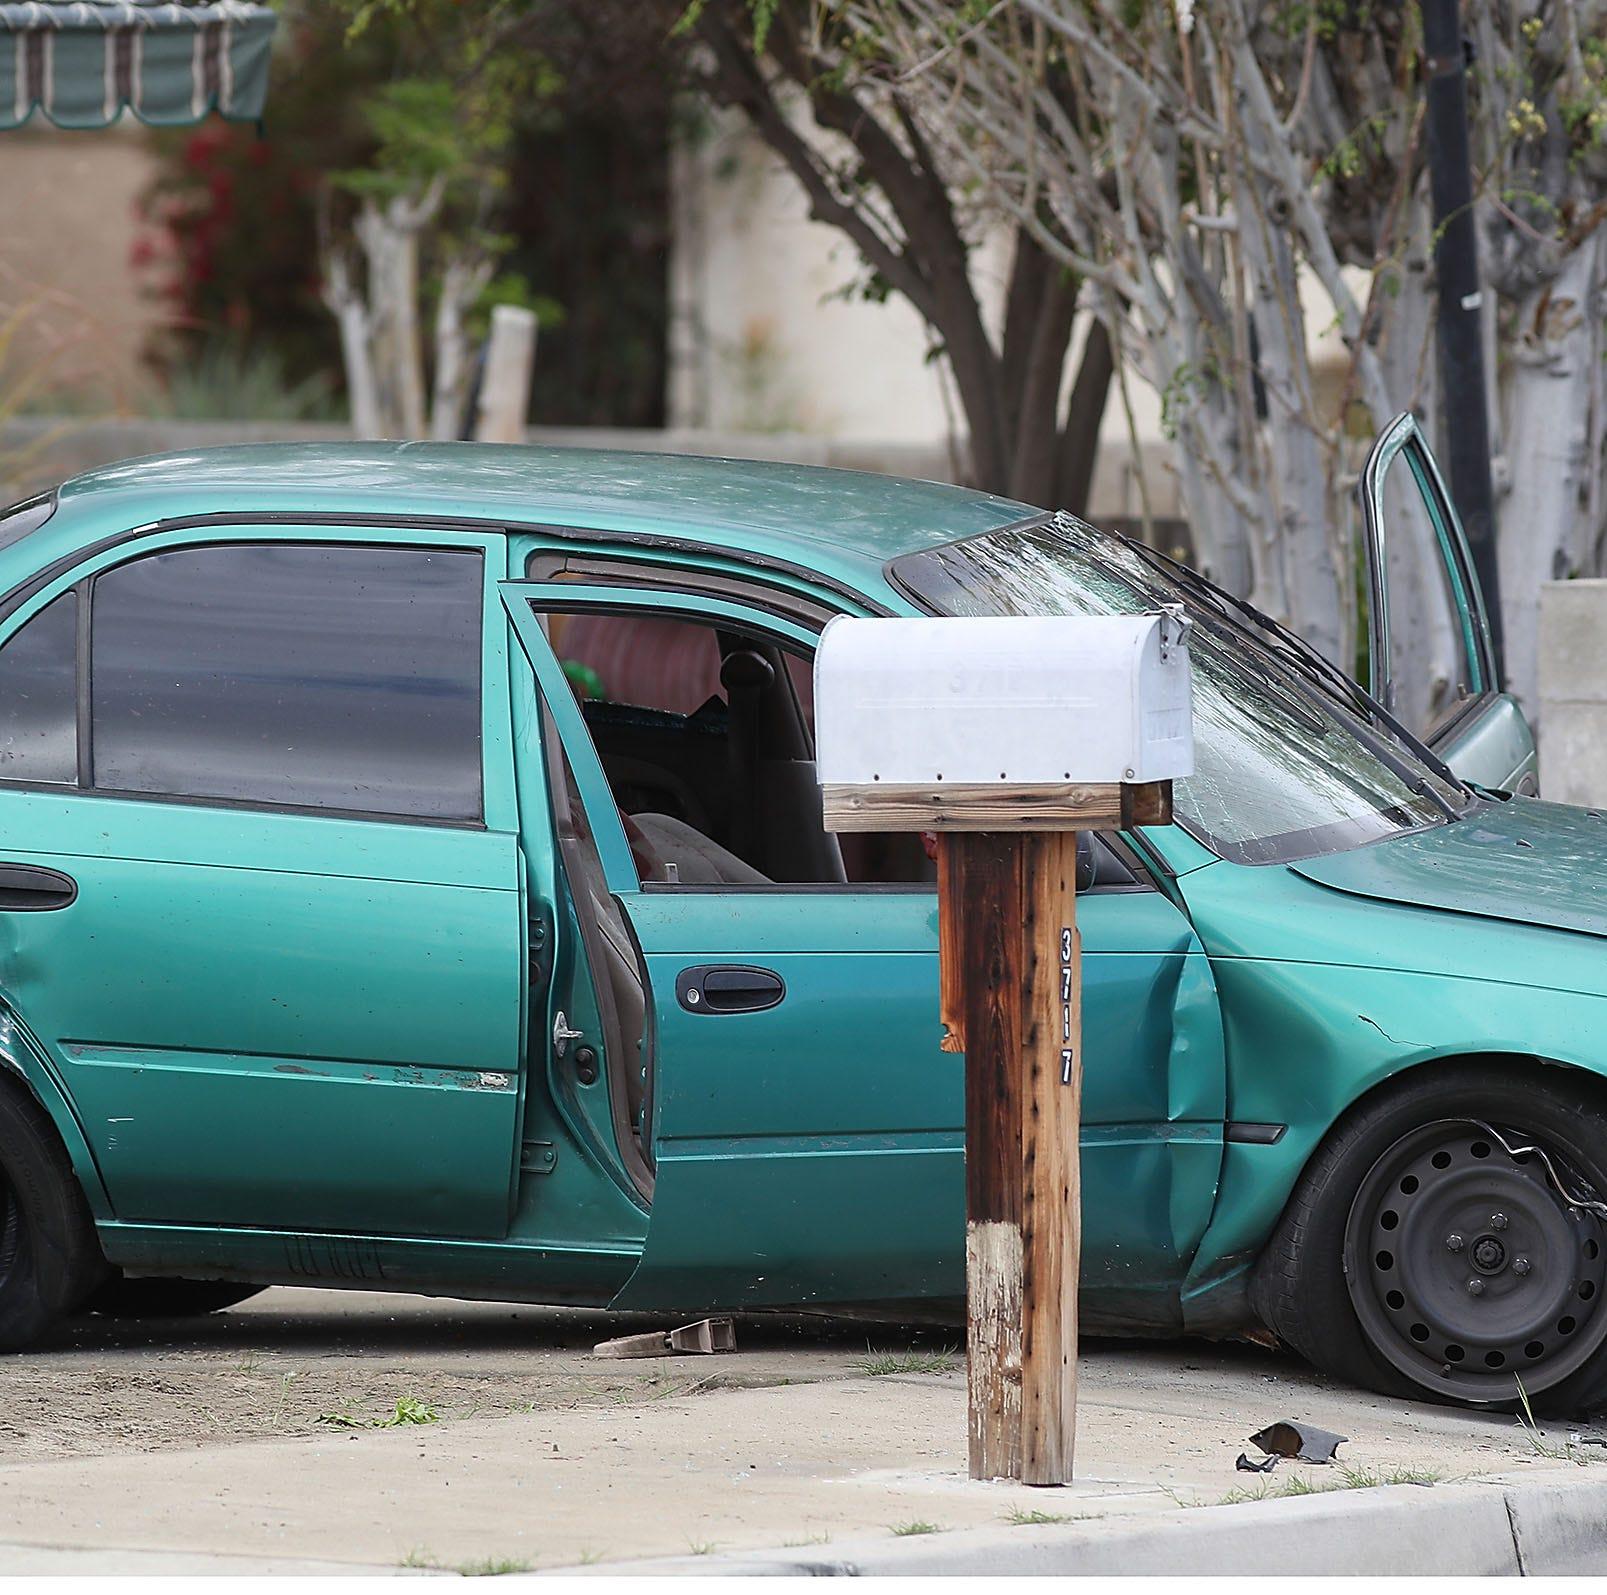 Palm Springs quadruple killing: A timeline of events